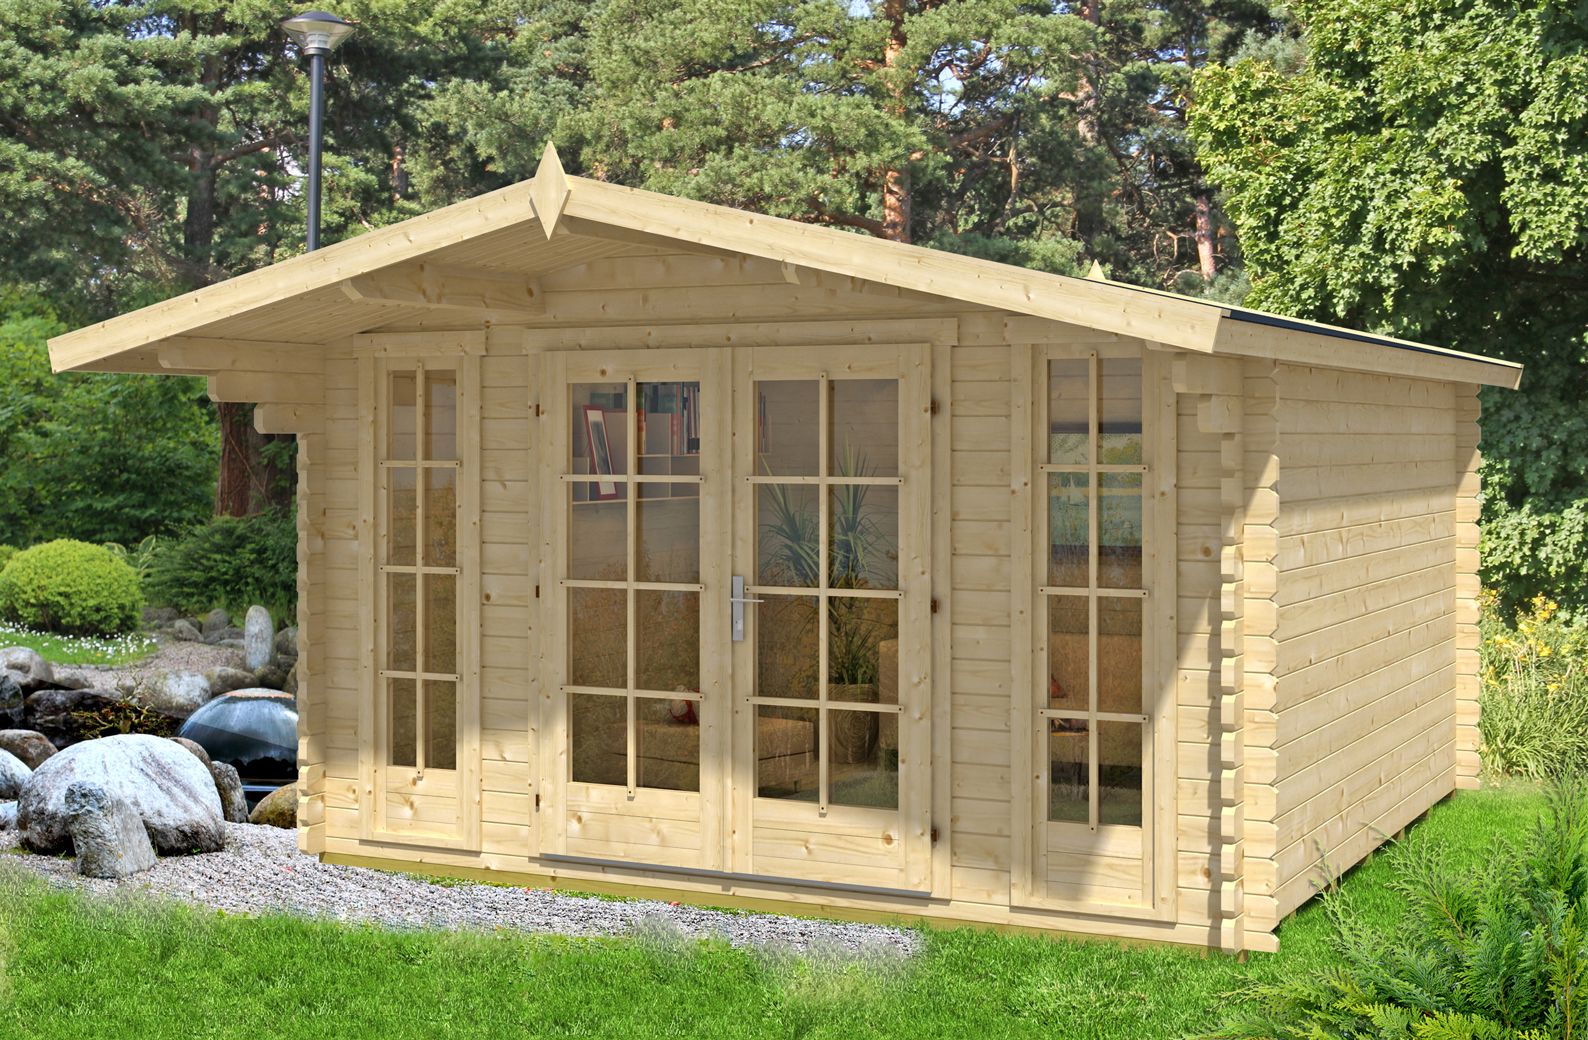 gartenhaus ausstellung westerwald my blog. Black Bedroom Furniture Sets. Home Design Ideas